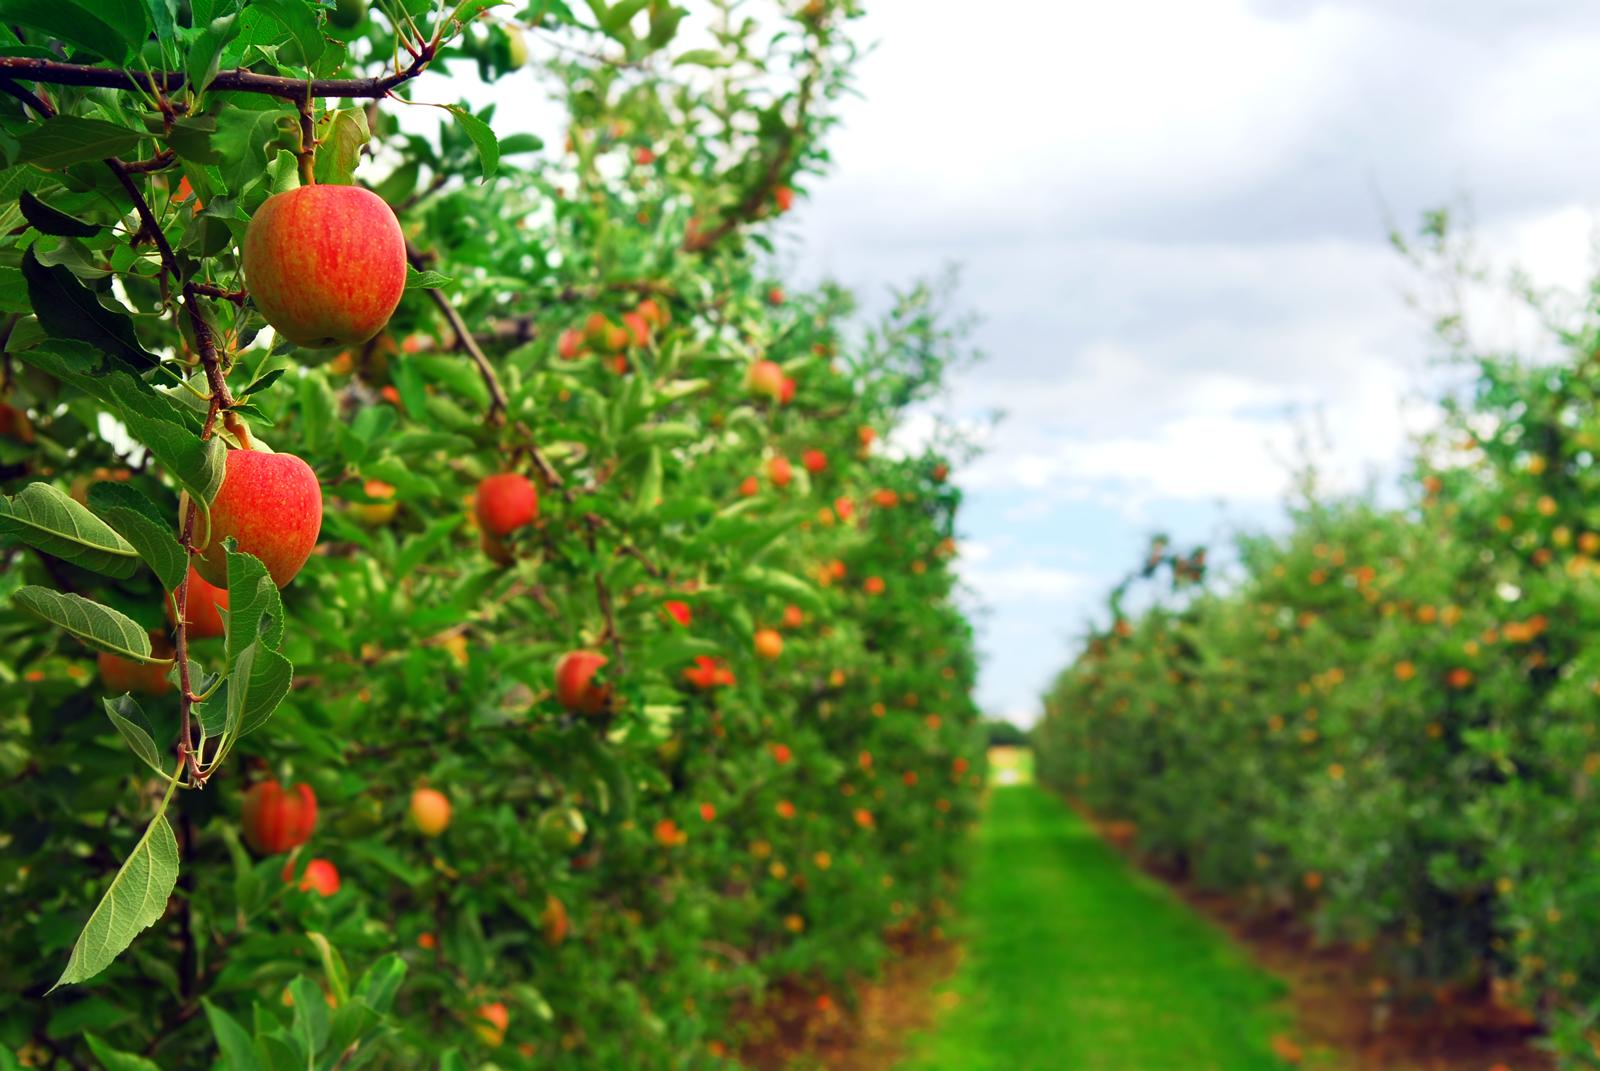 photodune-196400-apple-orchard-l